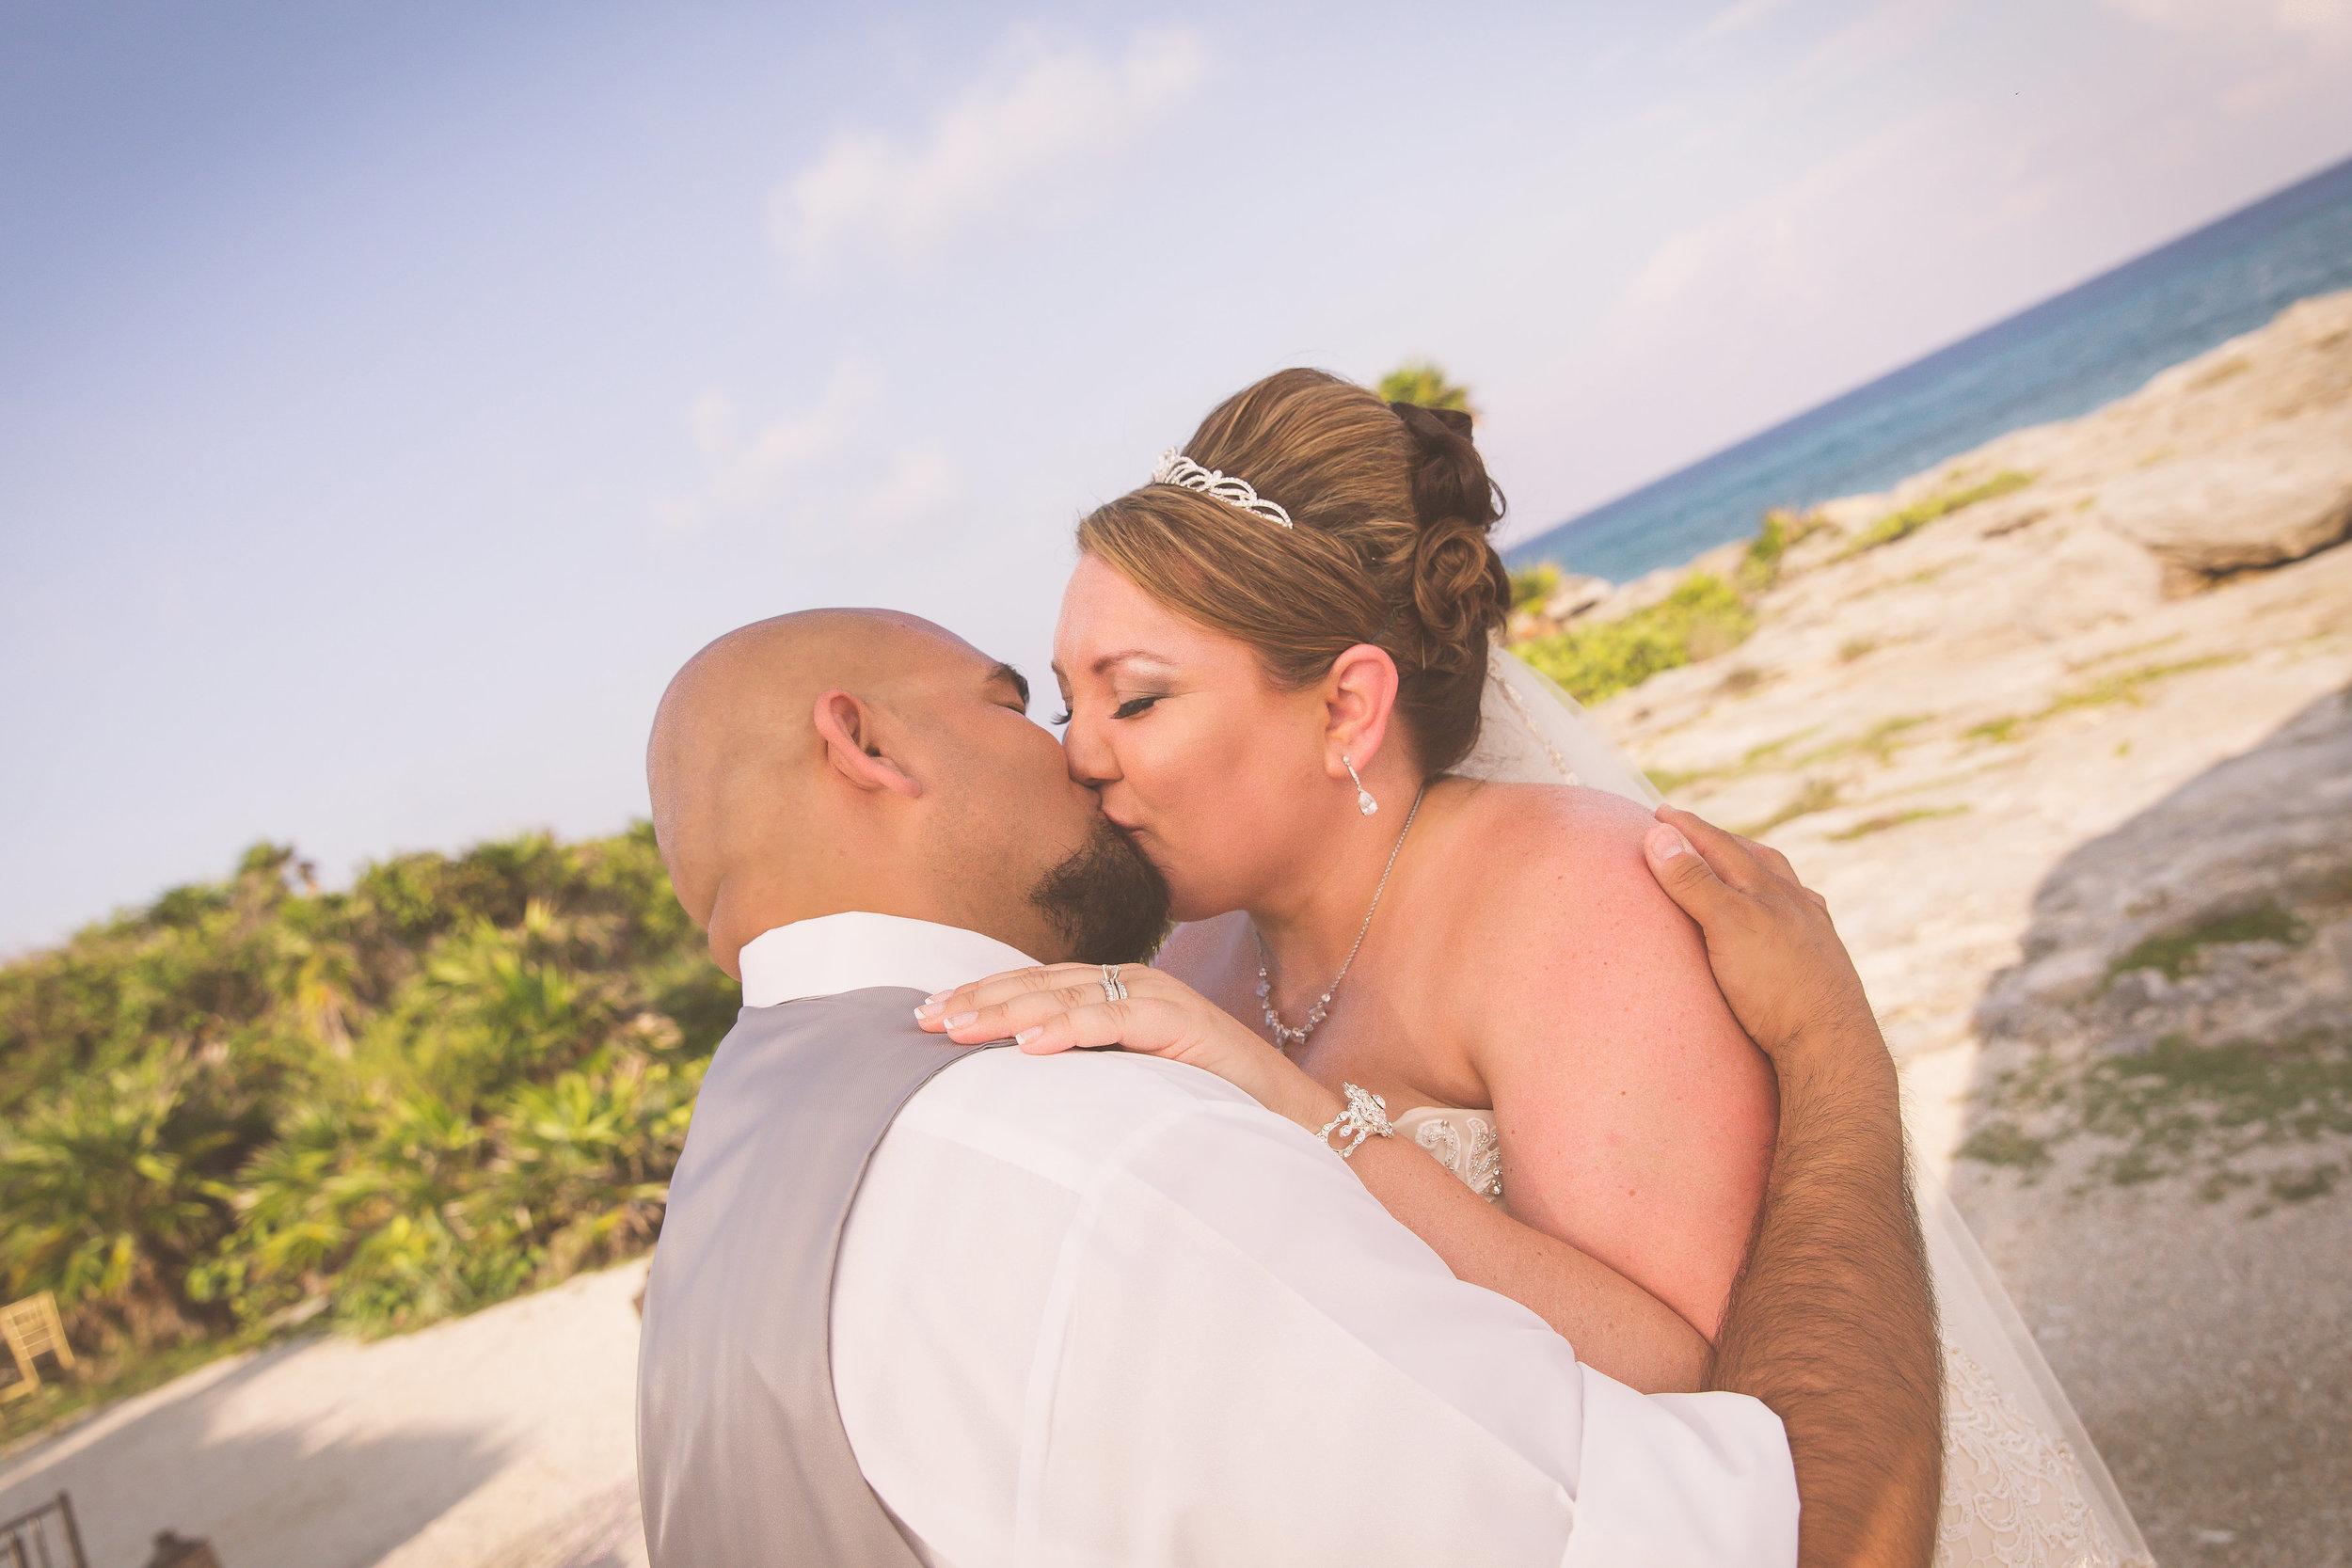 Desitination-Wedding-Photographers.jpg